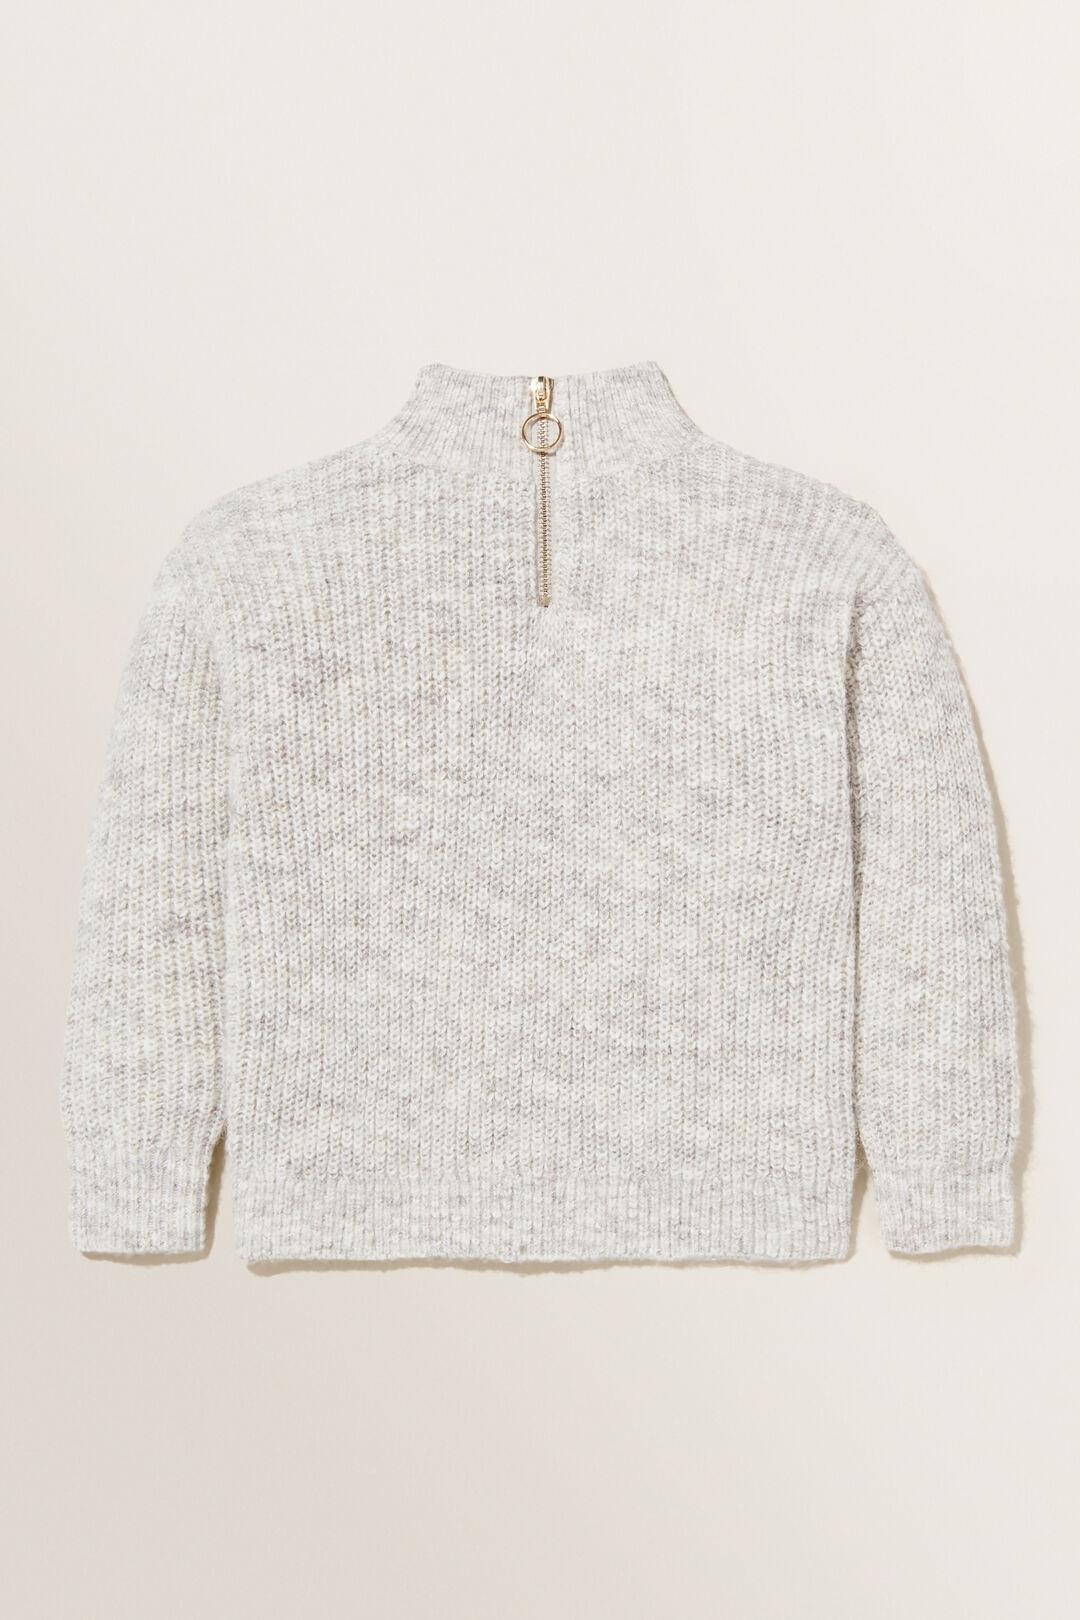 Zip Collar Knit Sweater  OAT MARLE  hi-res